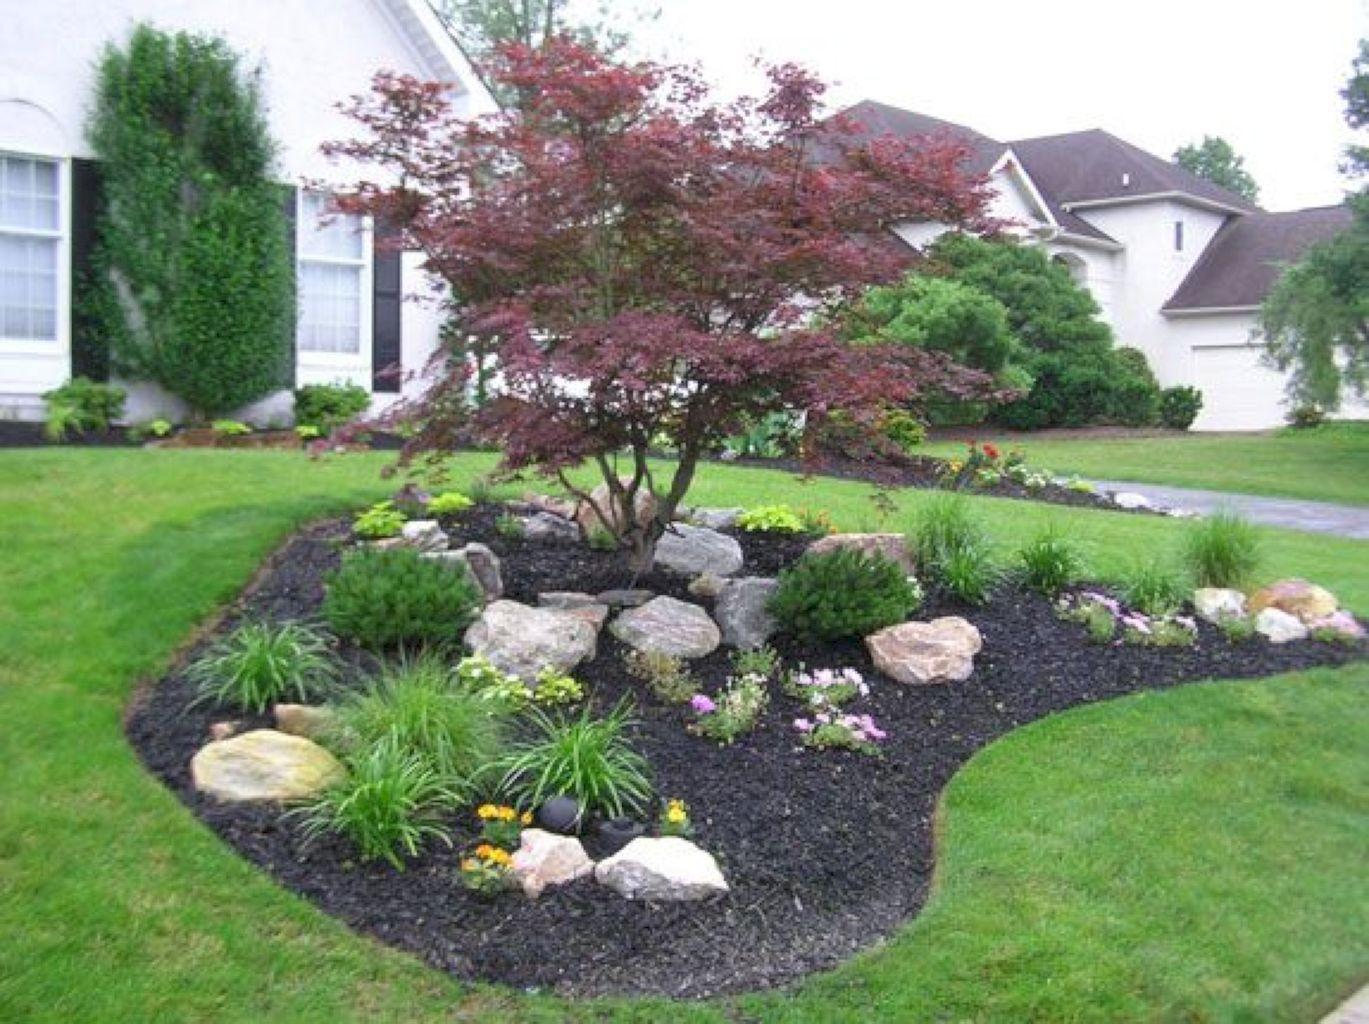 Best ideas about Garden Landscape Ideas . Save or Pin 54 Beautiful Front Yard Rock Garden Ideas Now.